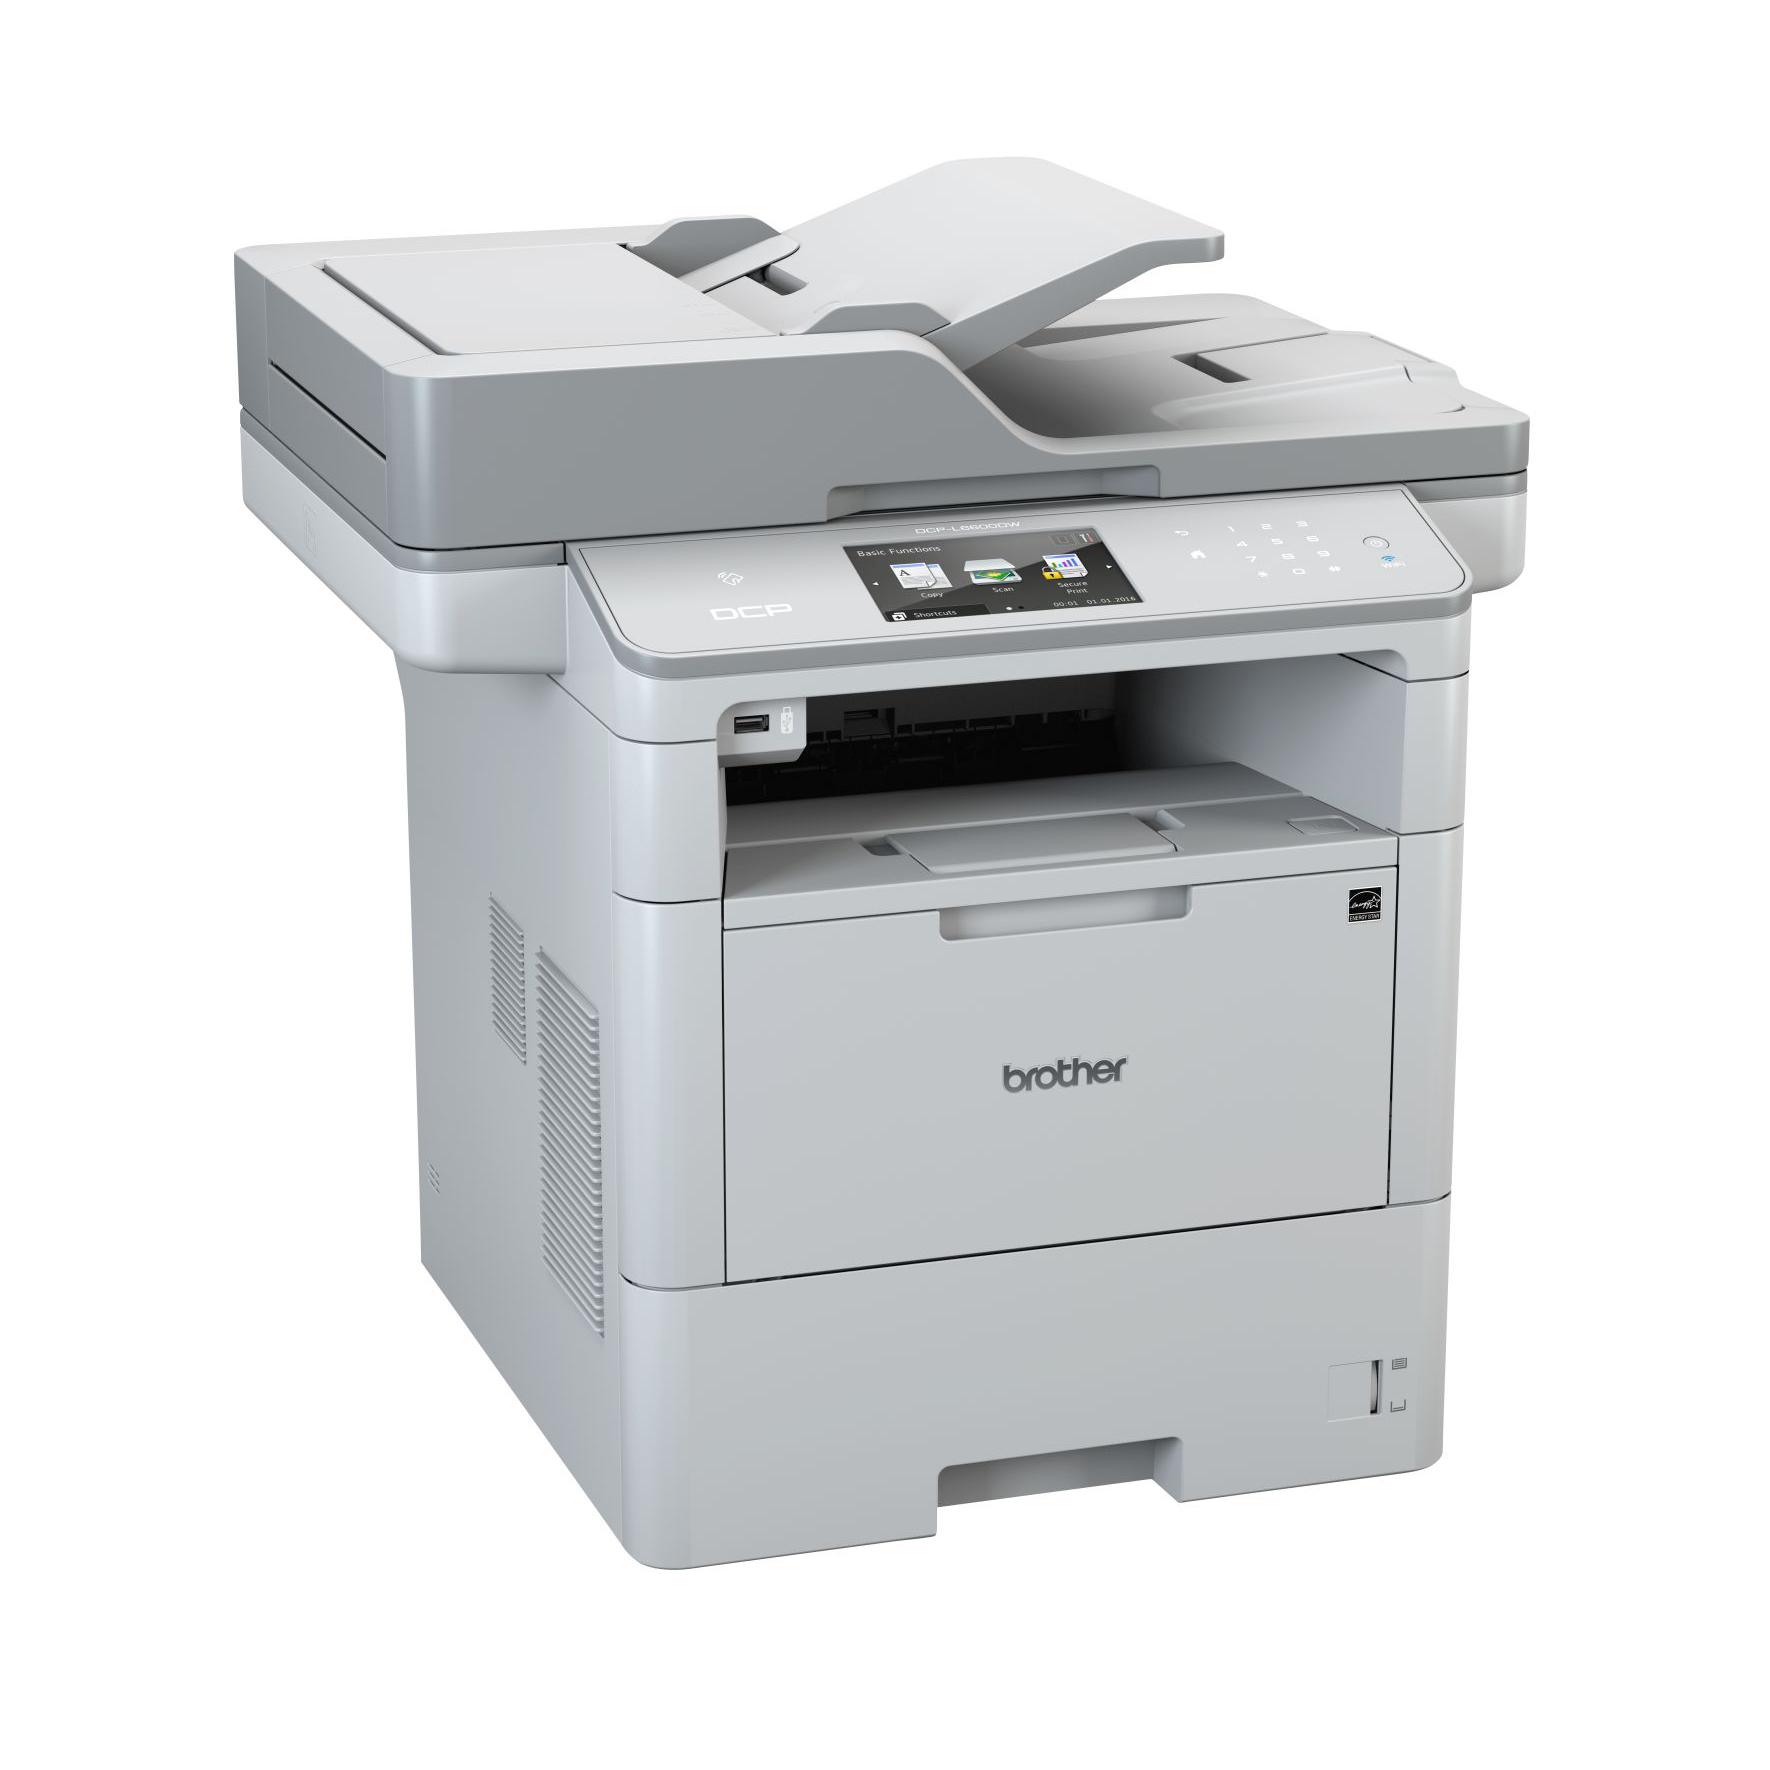 Принтер Brother DCP-L6600DW